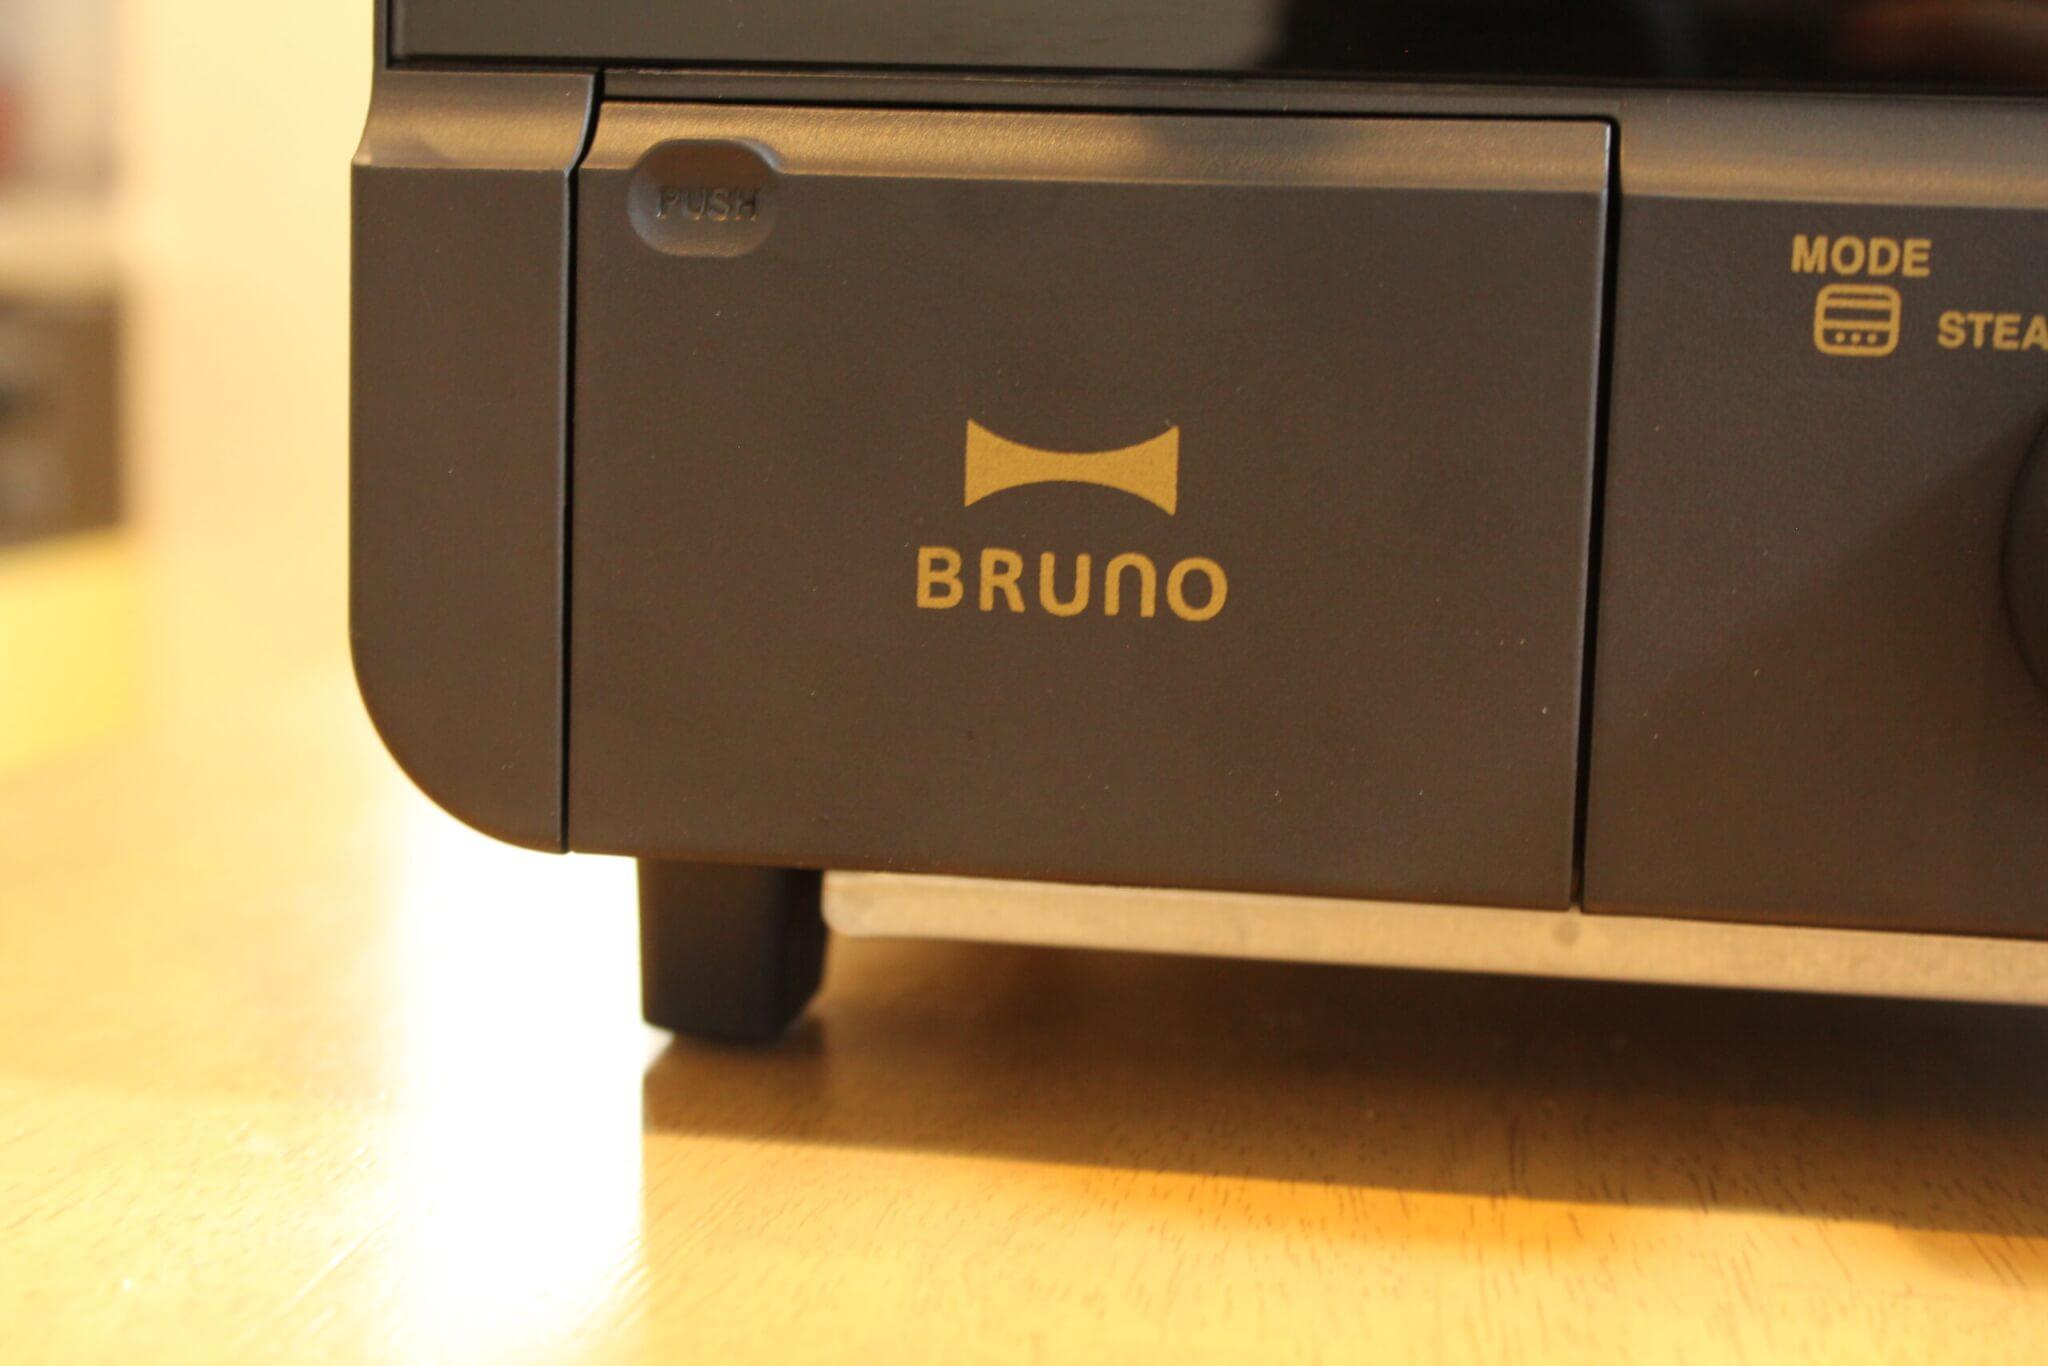 BRUNO crassy+ スチーム&ベイク トースター